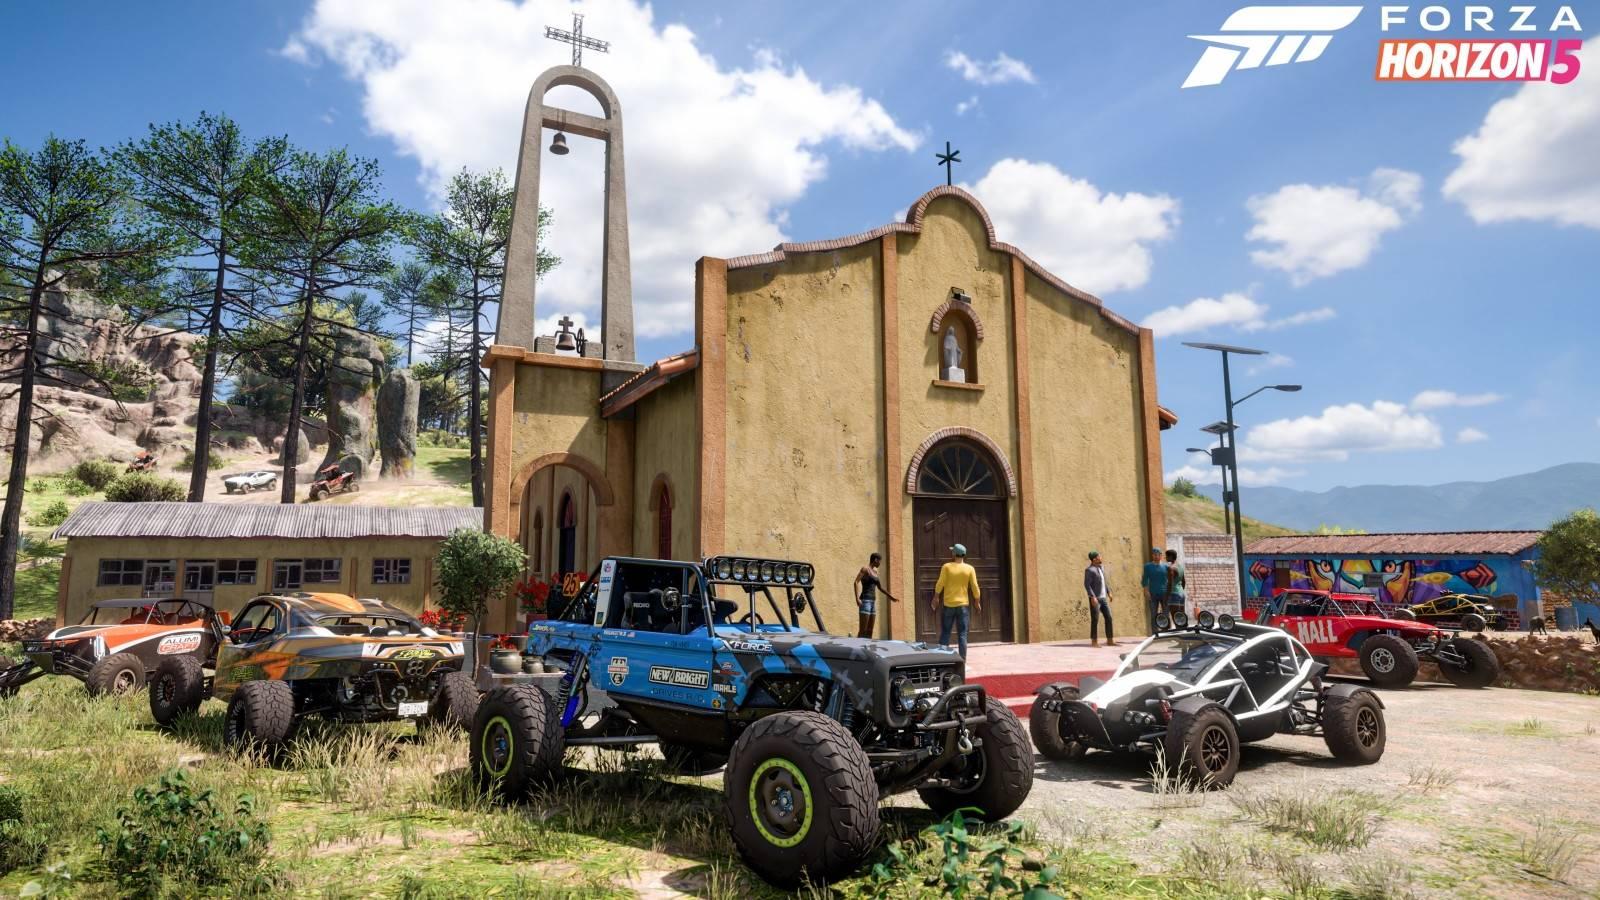 Forza Horizon 5 cars outside church